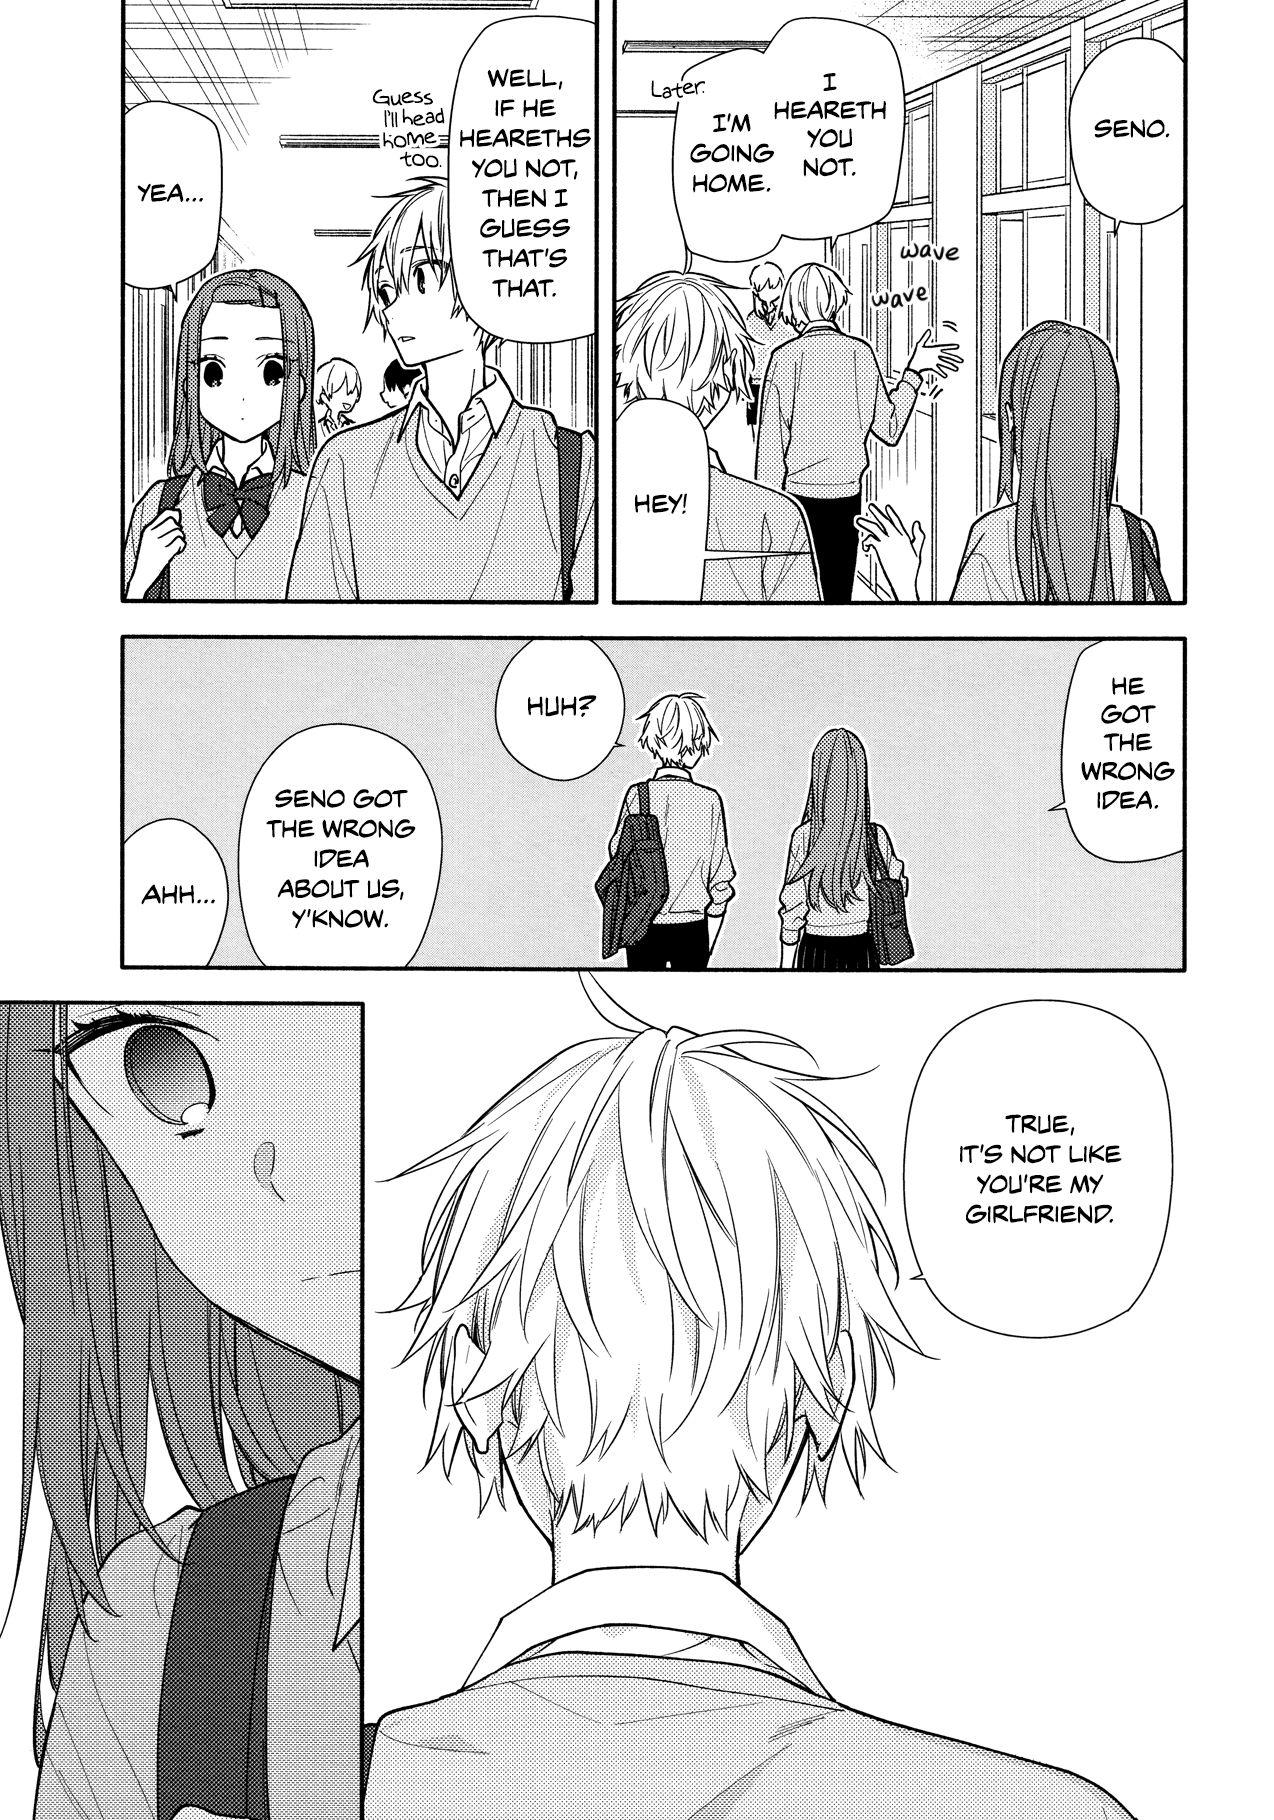 Horimiya, Chapter 121 Page 5